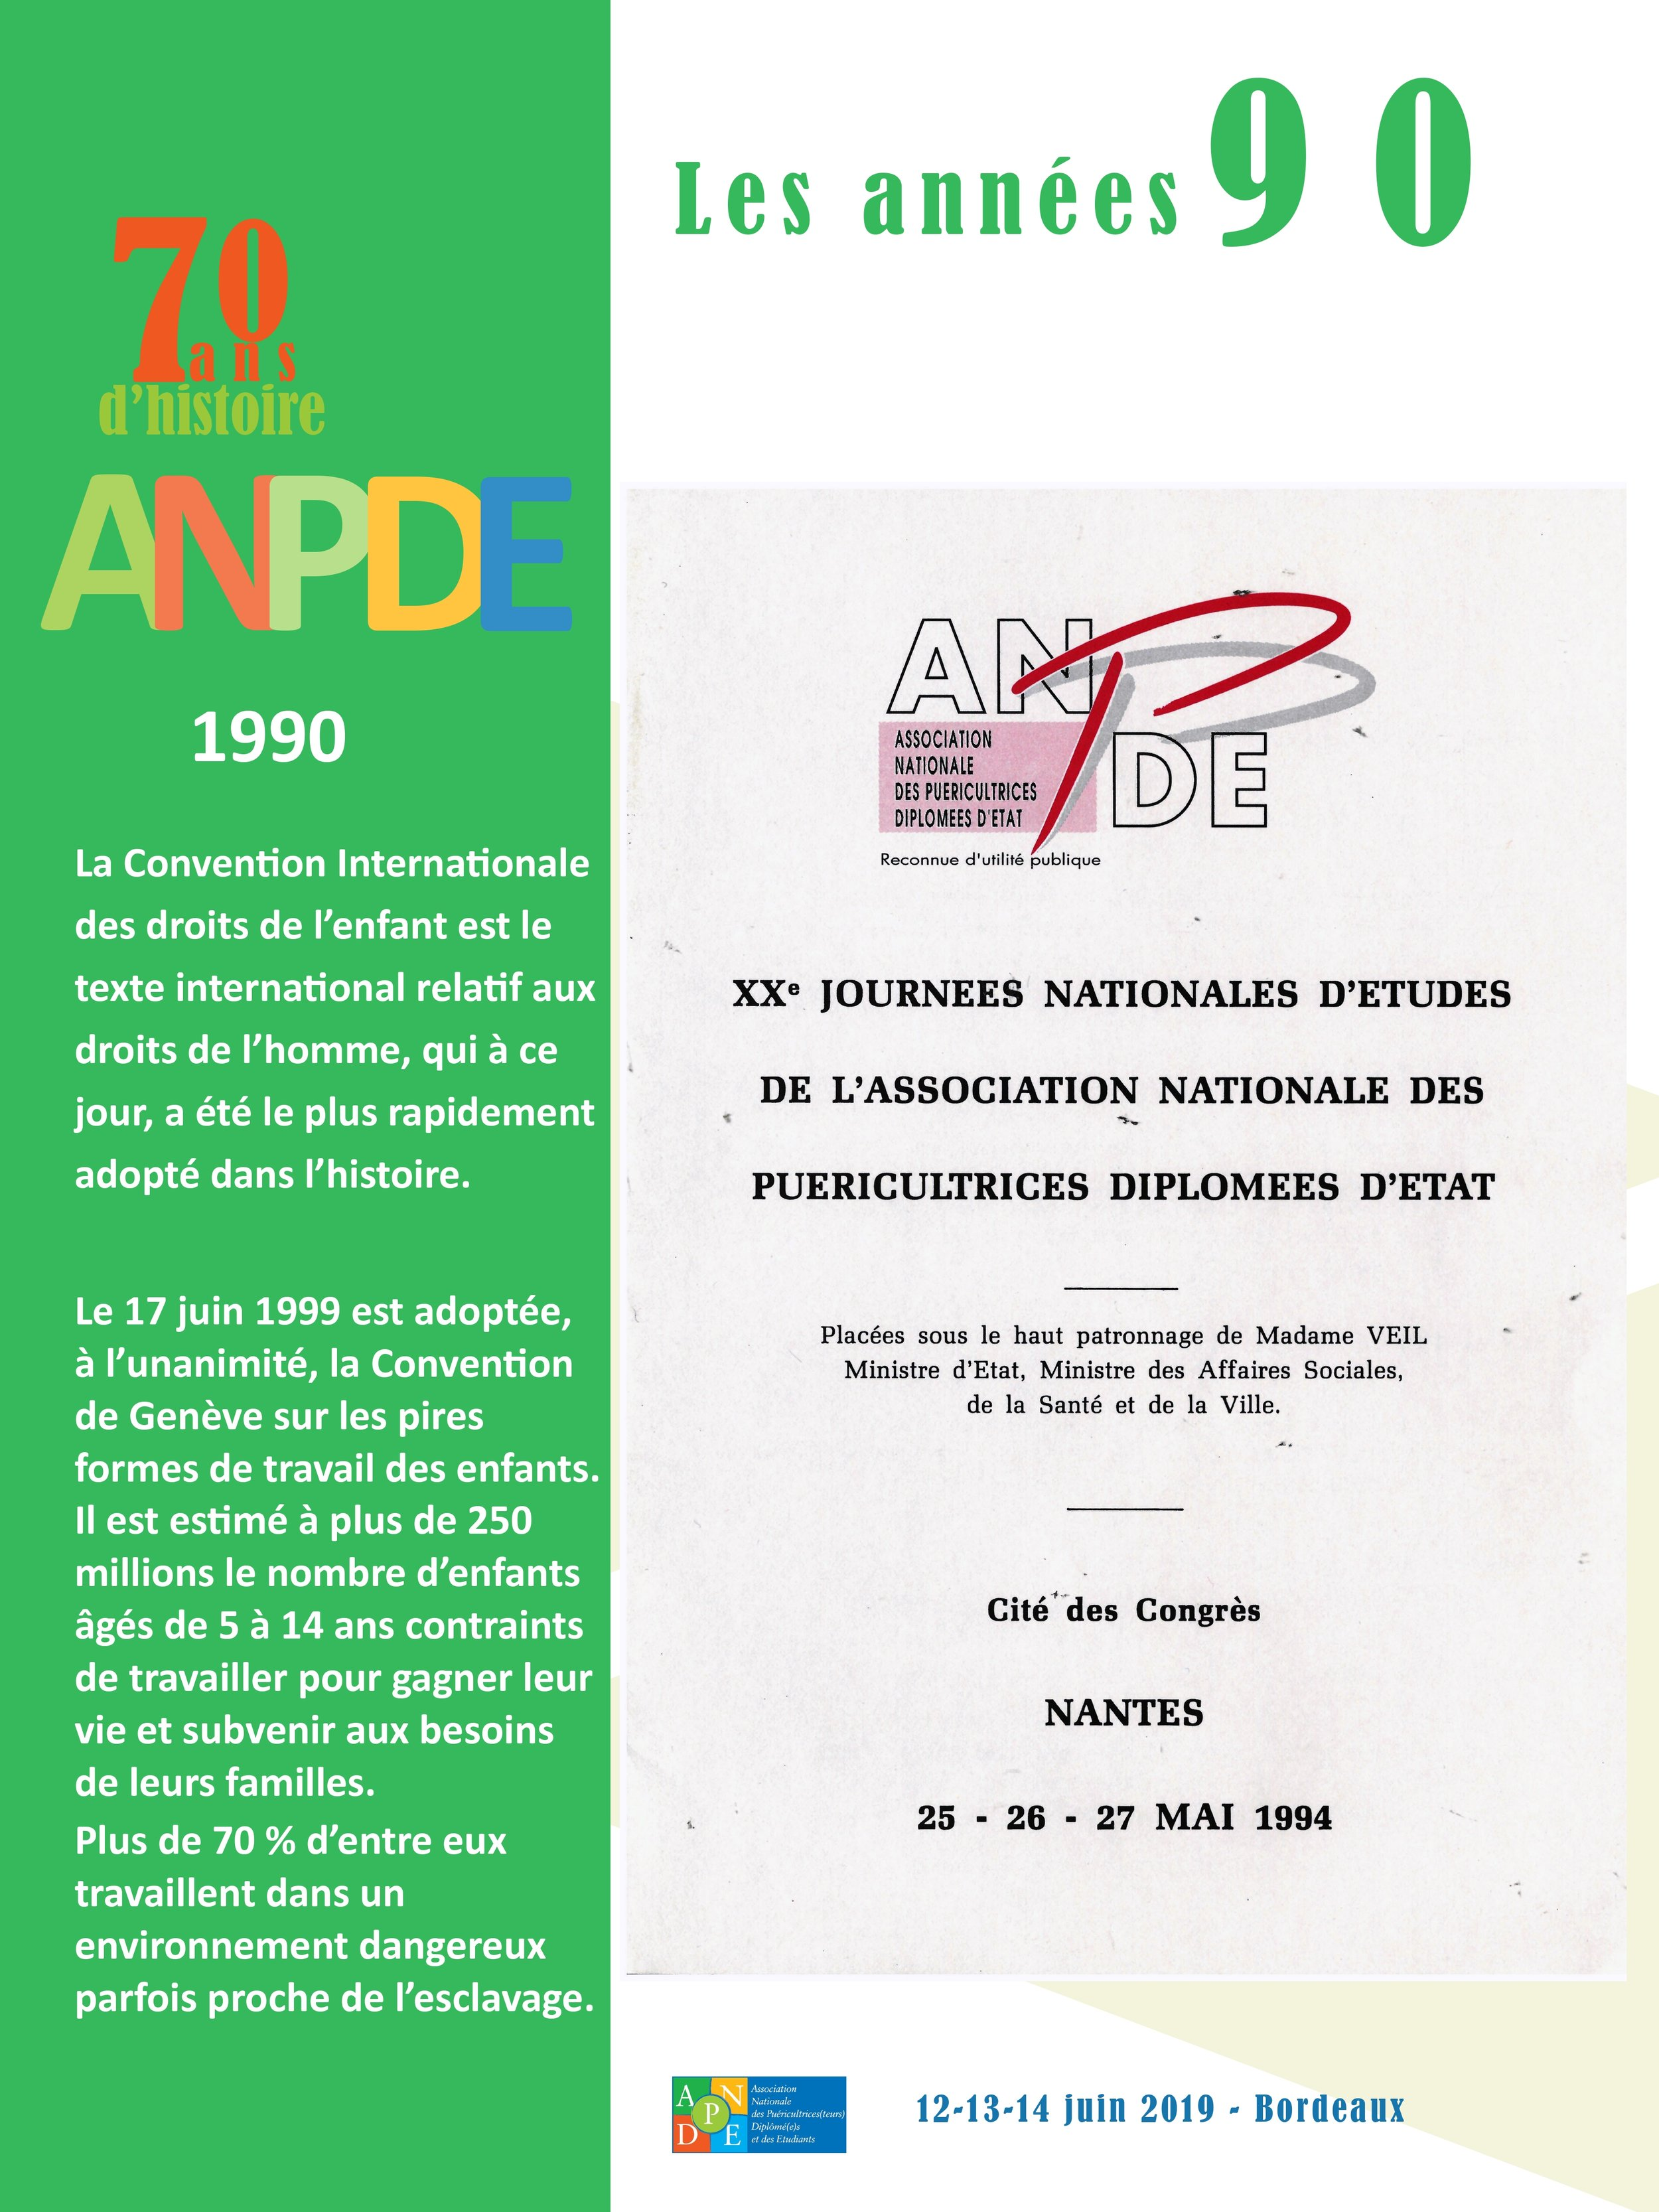 1990_anpde.jpg